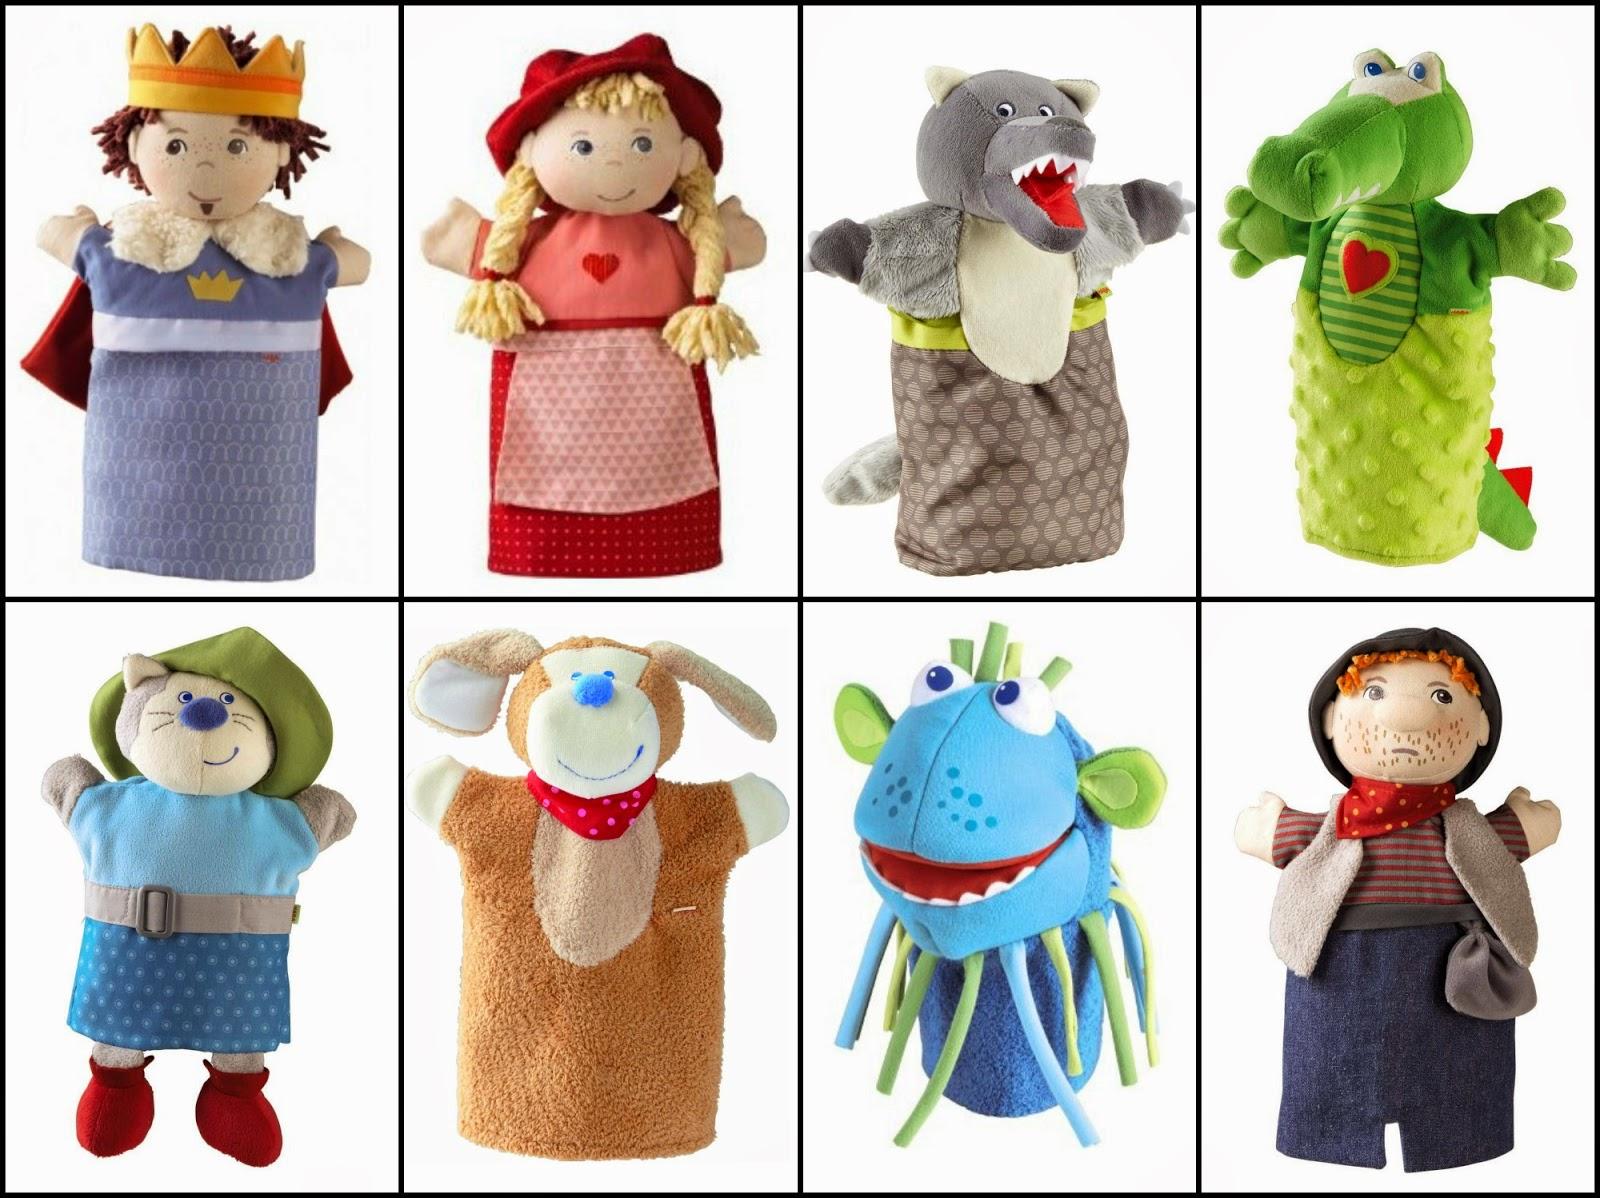 HABA puppets